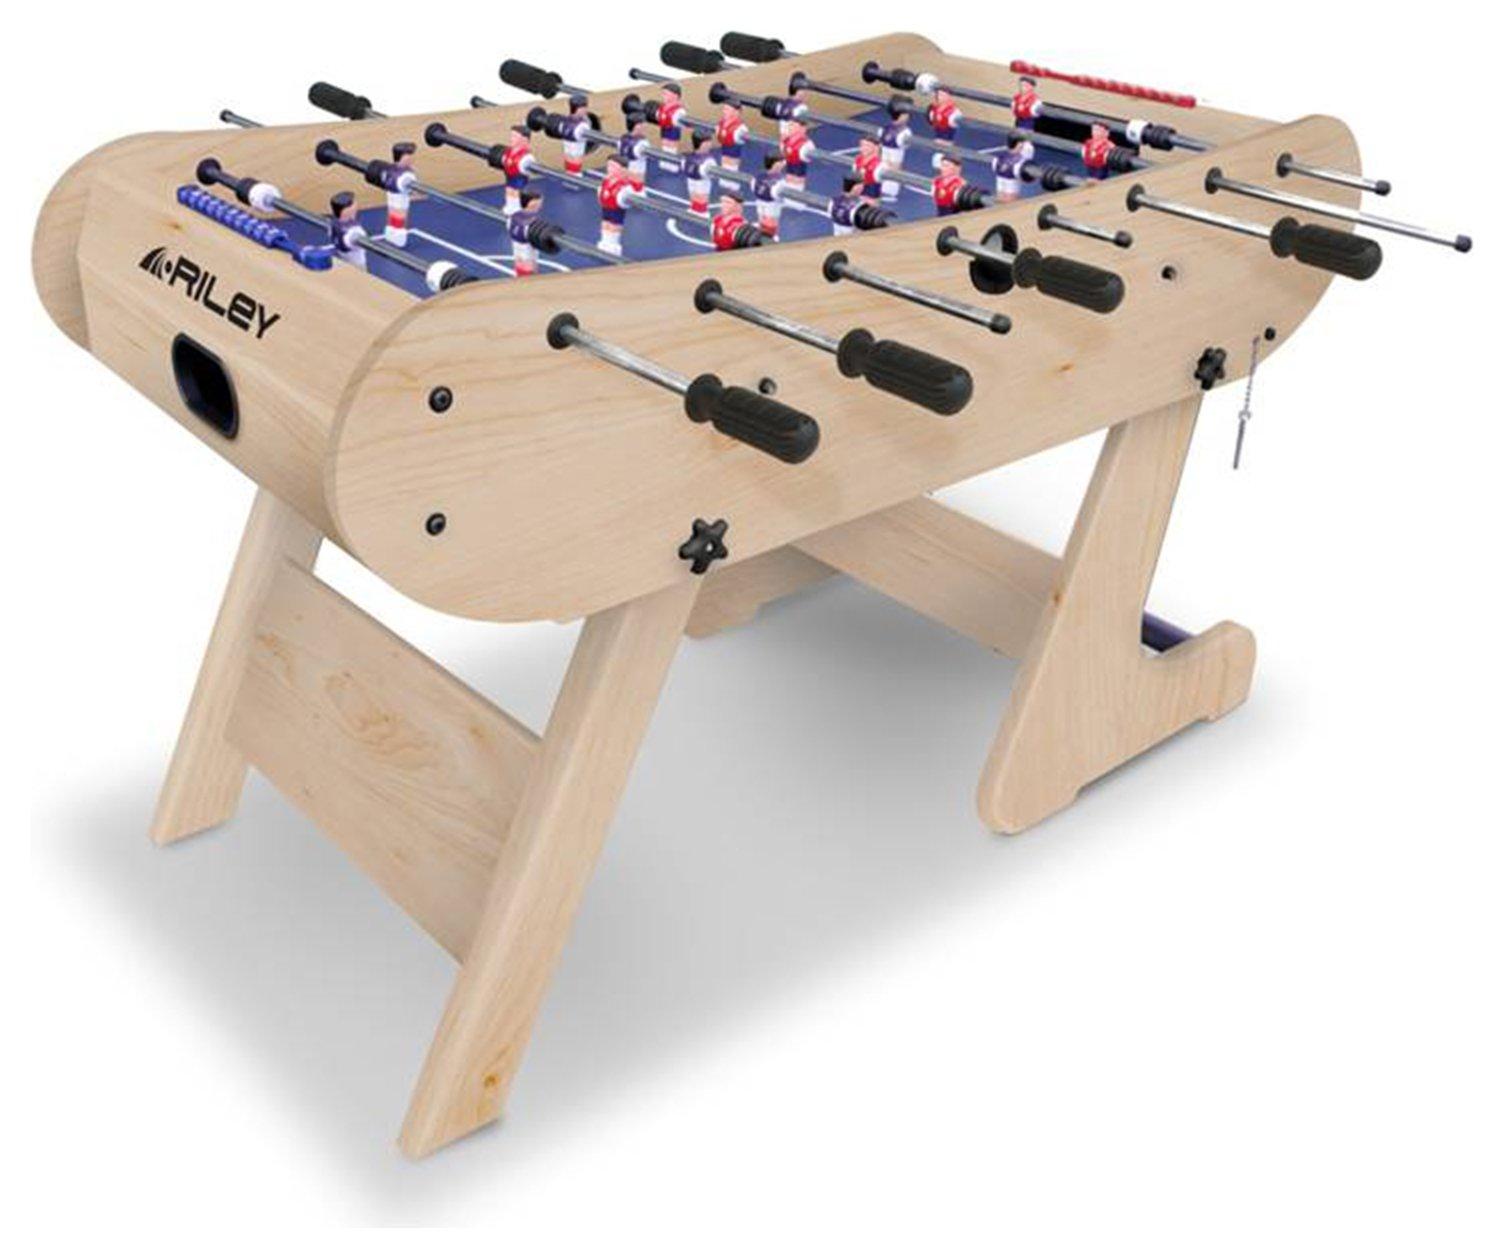 Riley Azteca 4 Foot Folding Football Table